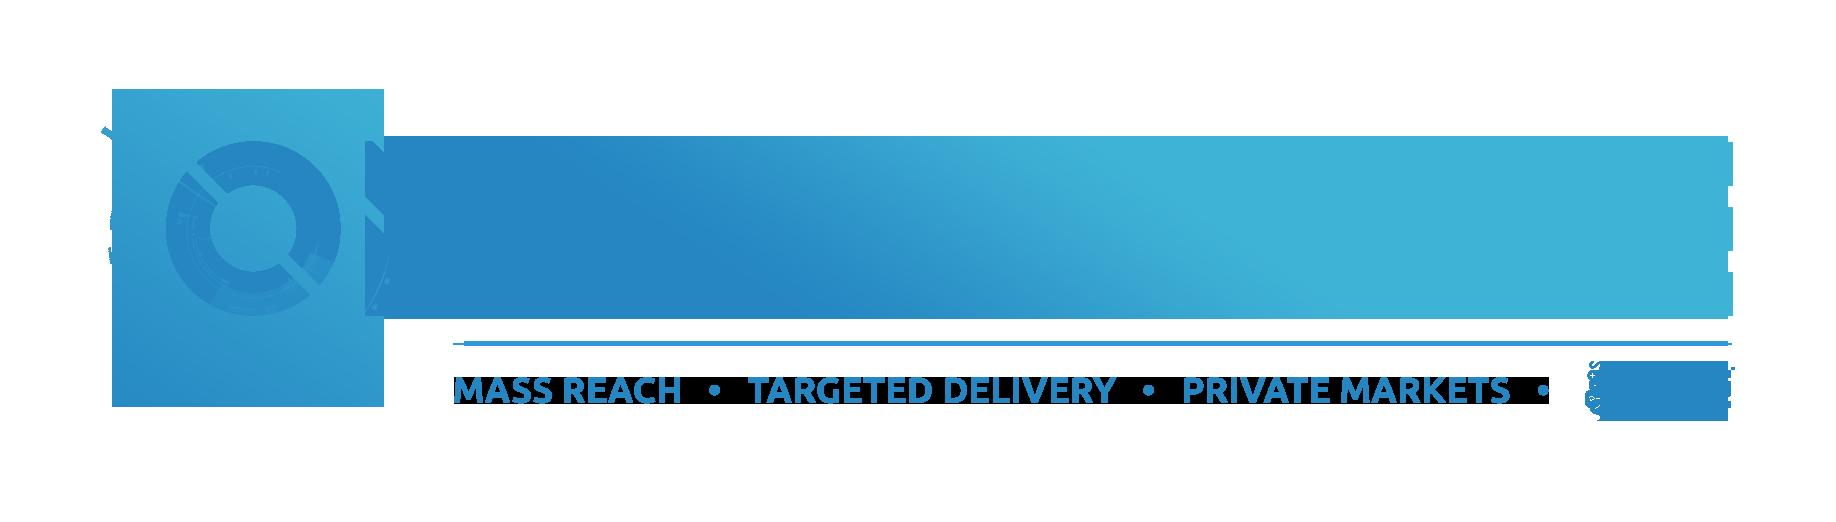 OmniScope_logo